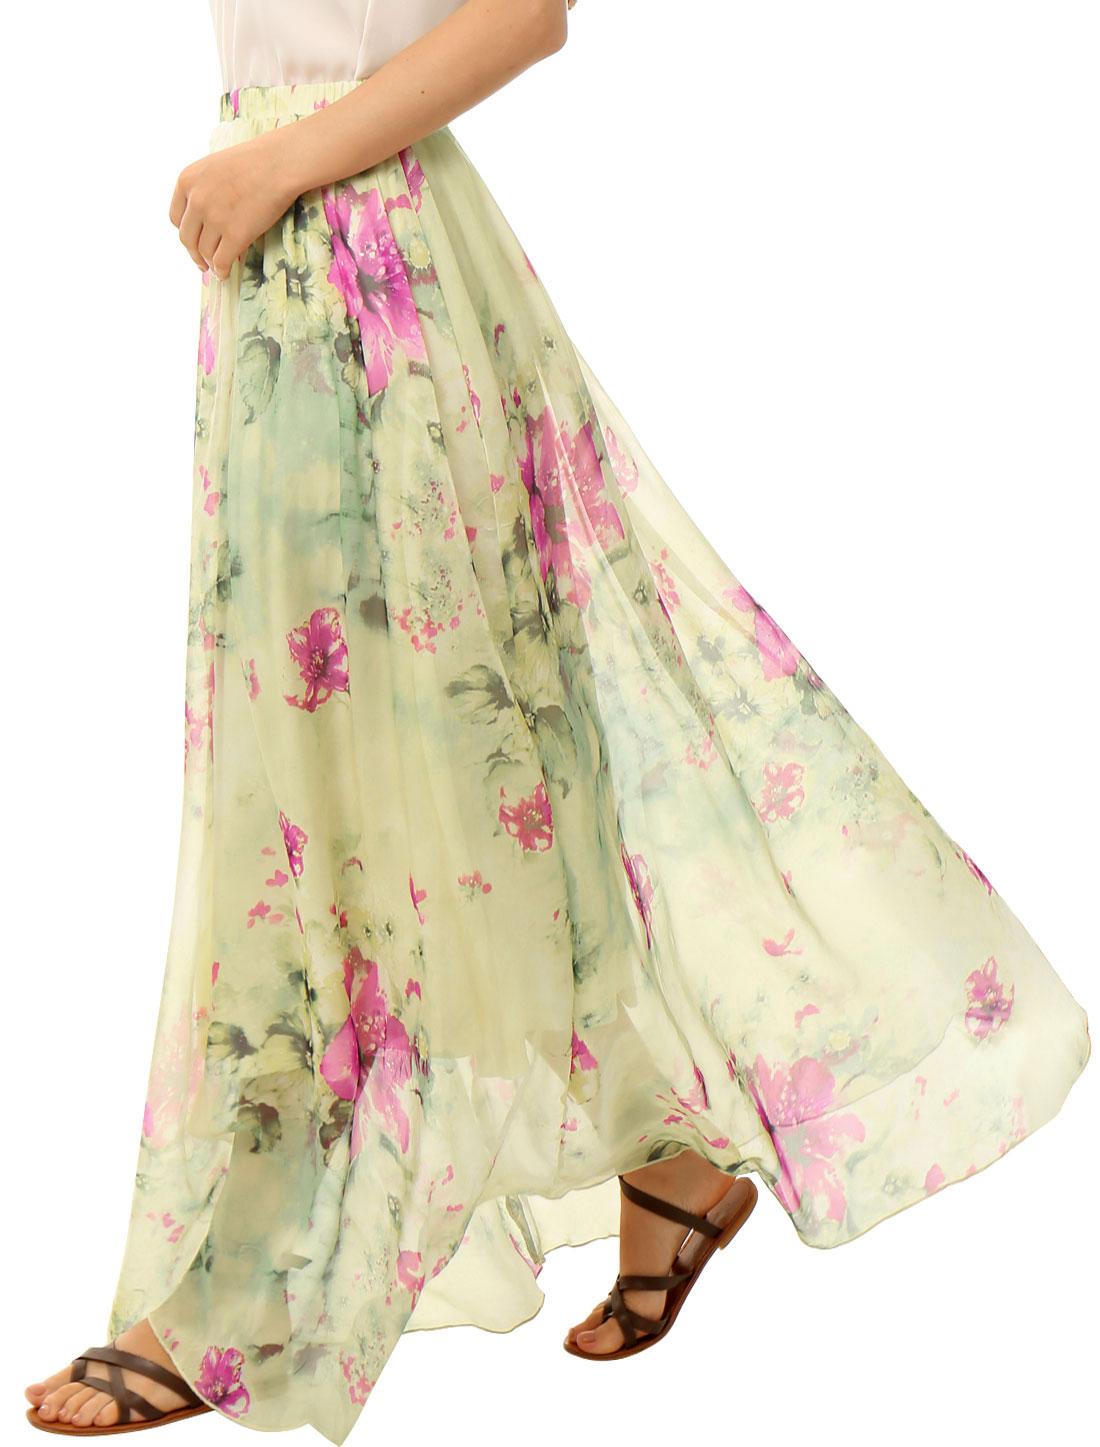 Women Elastic Waist Floral Prints Chiffon Flowy Maxi Skirt Beige L